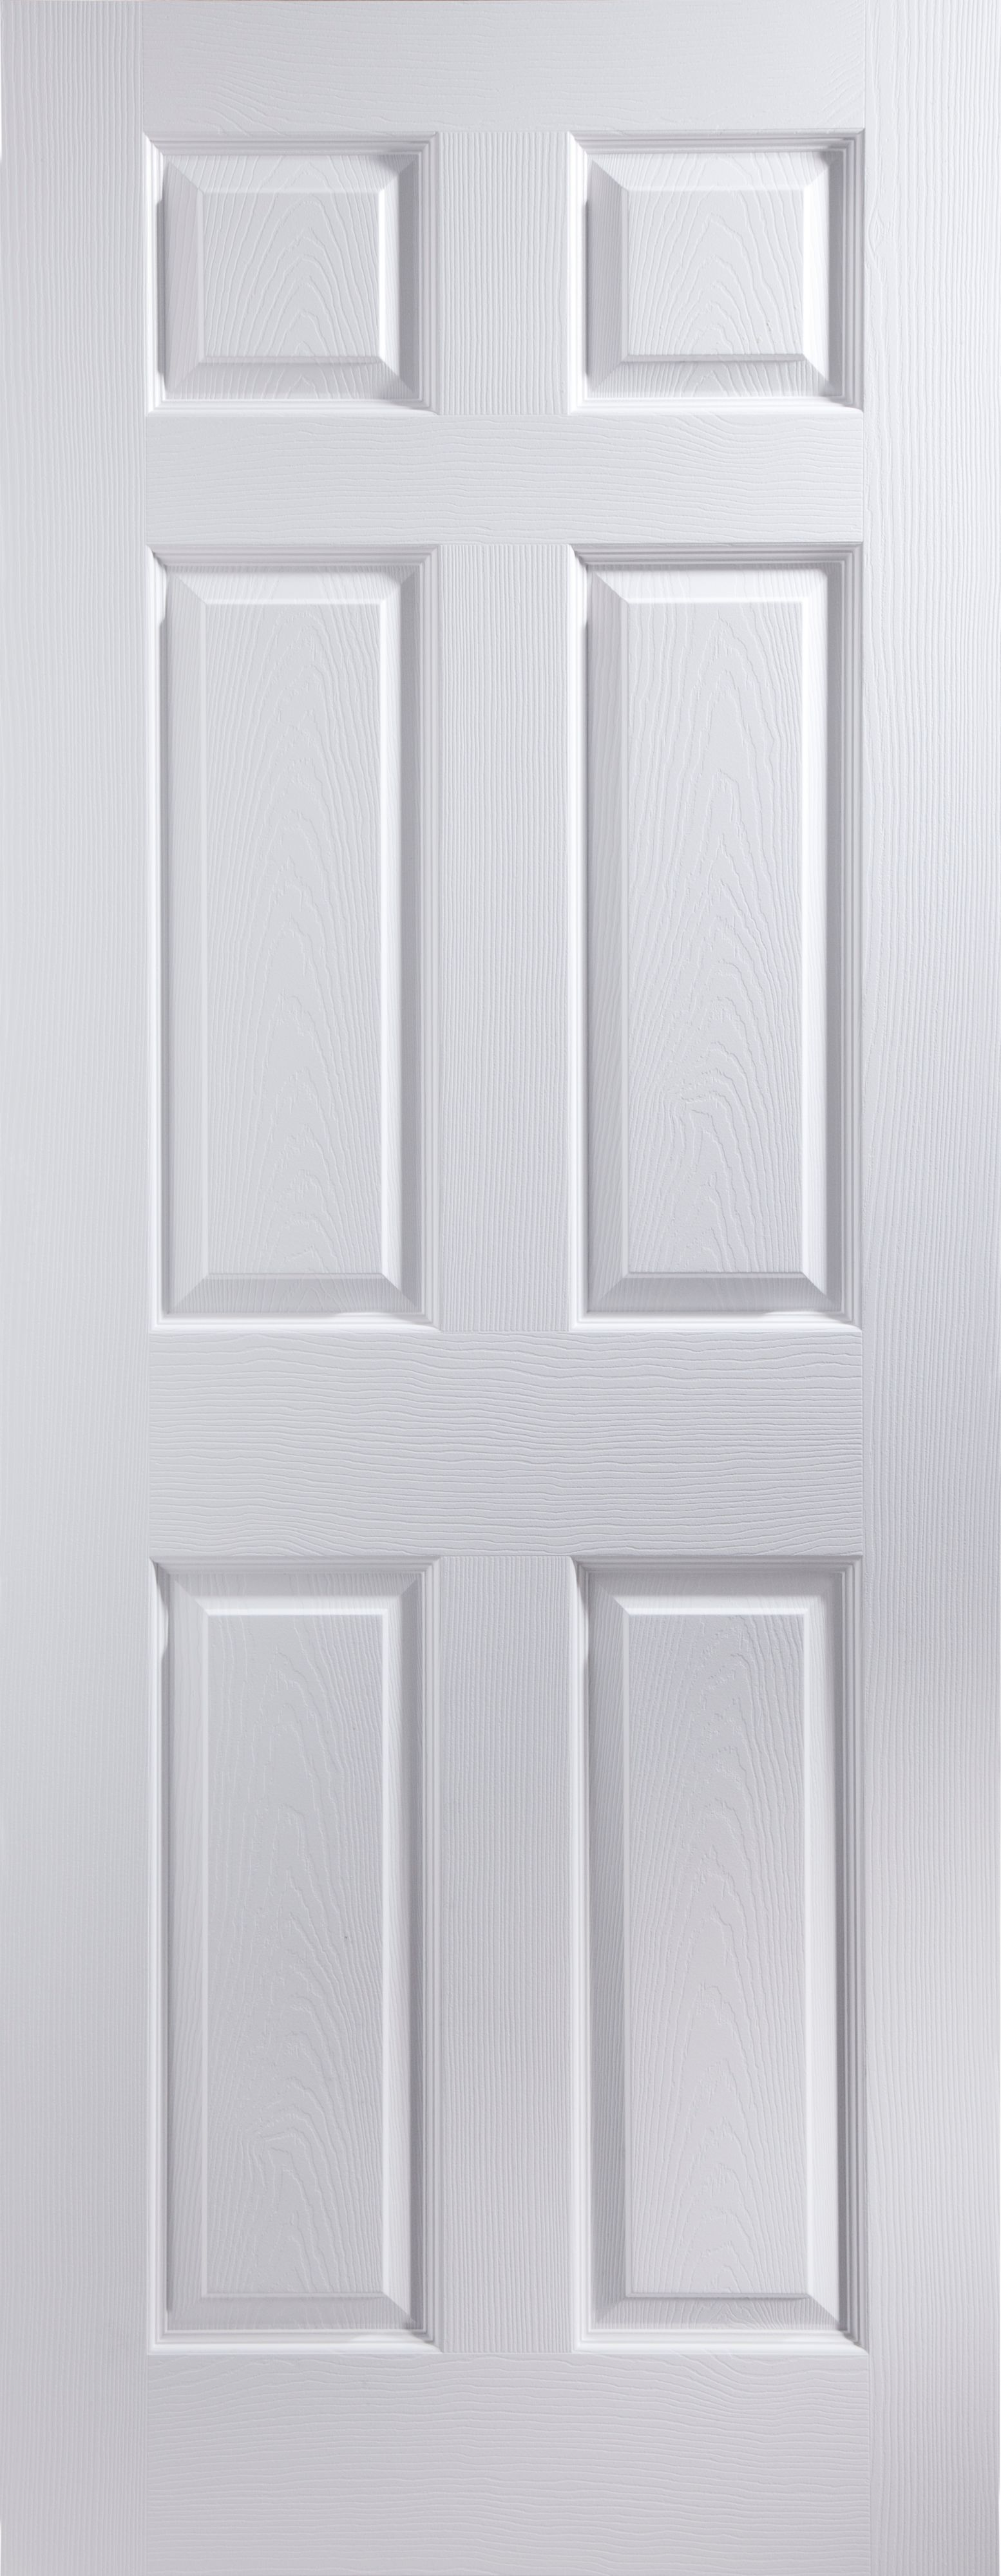 6 Panel Primed Woodgrain Effect Unglazed Internal Standard Door (H)2040mm (W)726mm   Departments   DIY at Bu0026Q  sc 1 st  Bu0026Q & 6 Panel Primed Woodgrain Effect Unglazed Internal Standard Door ... pezcame.com